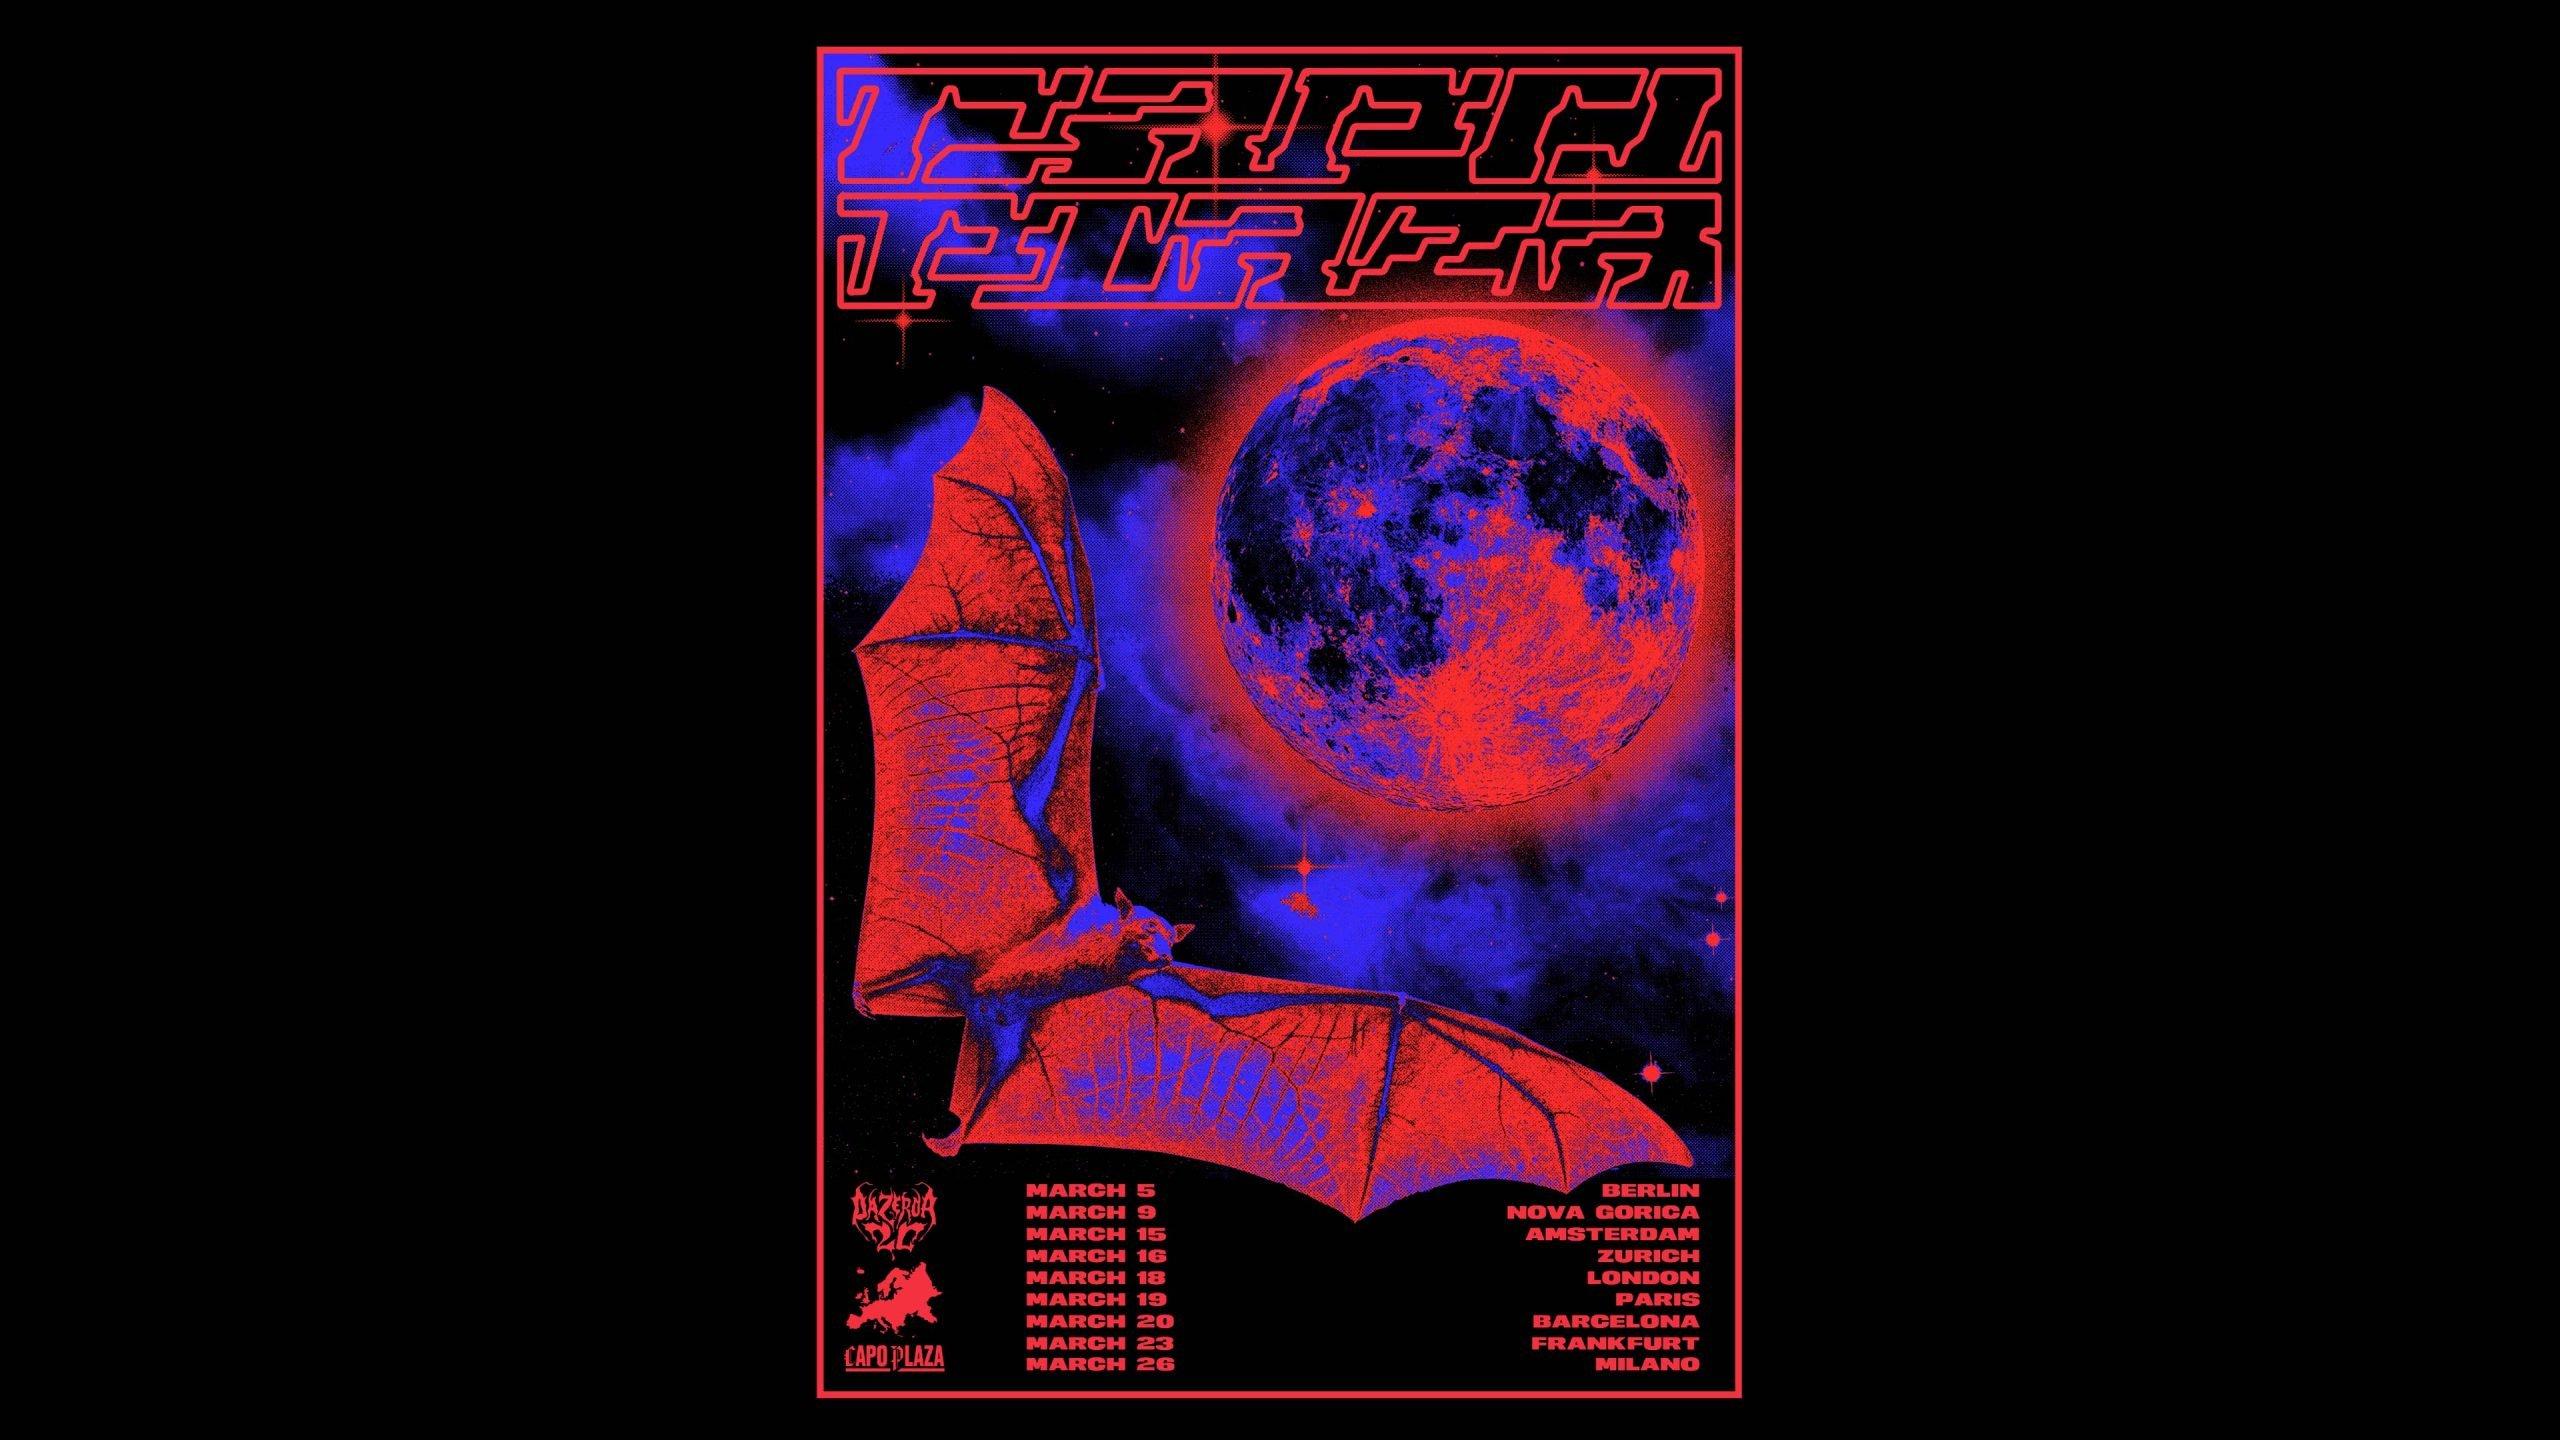 CAPO-PLAZA-TOUR-MERCH-Product-03-Graphics-02